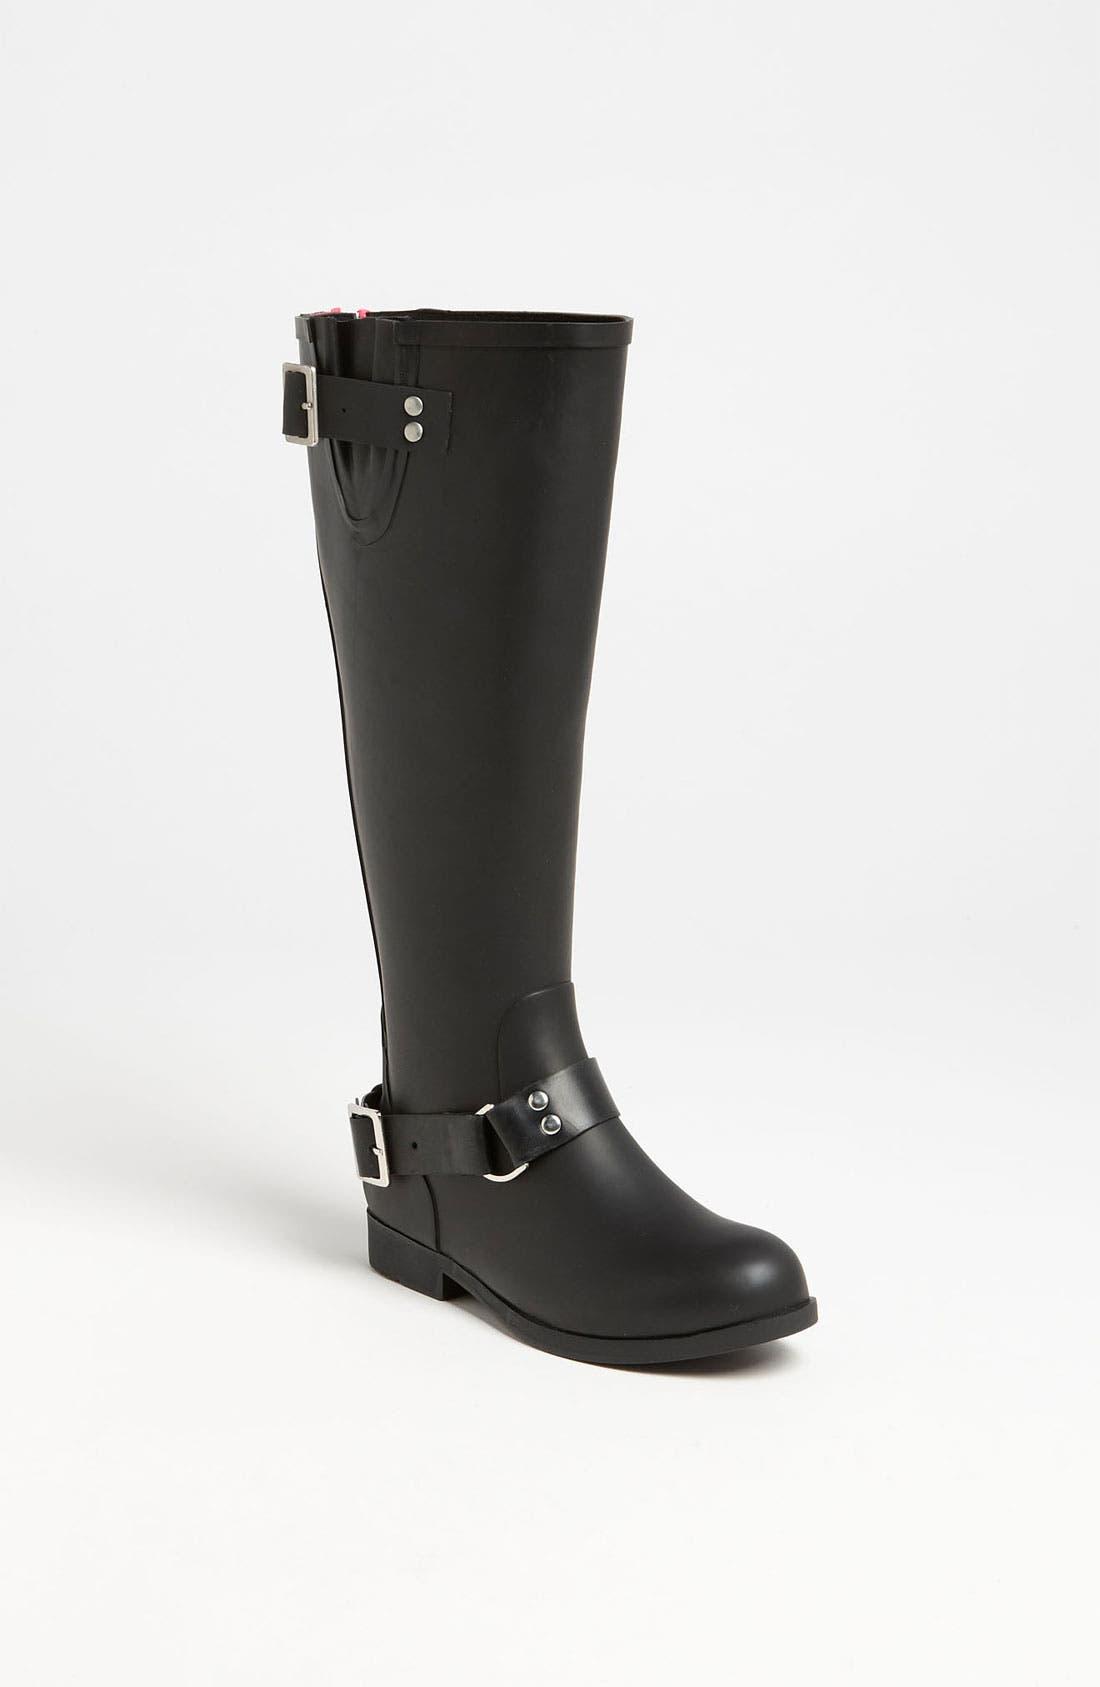 Main Image - Steve Madden 'Tsunamii' Contrast Zip Rain Boot (Women)